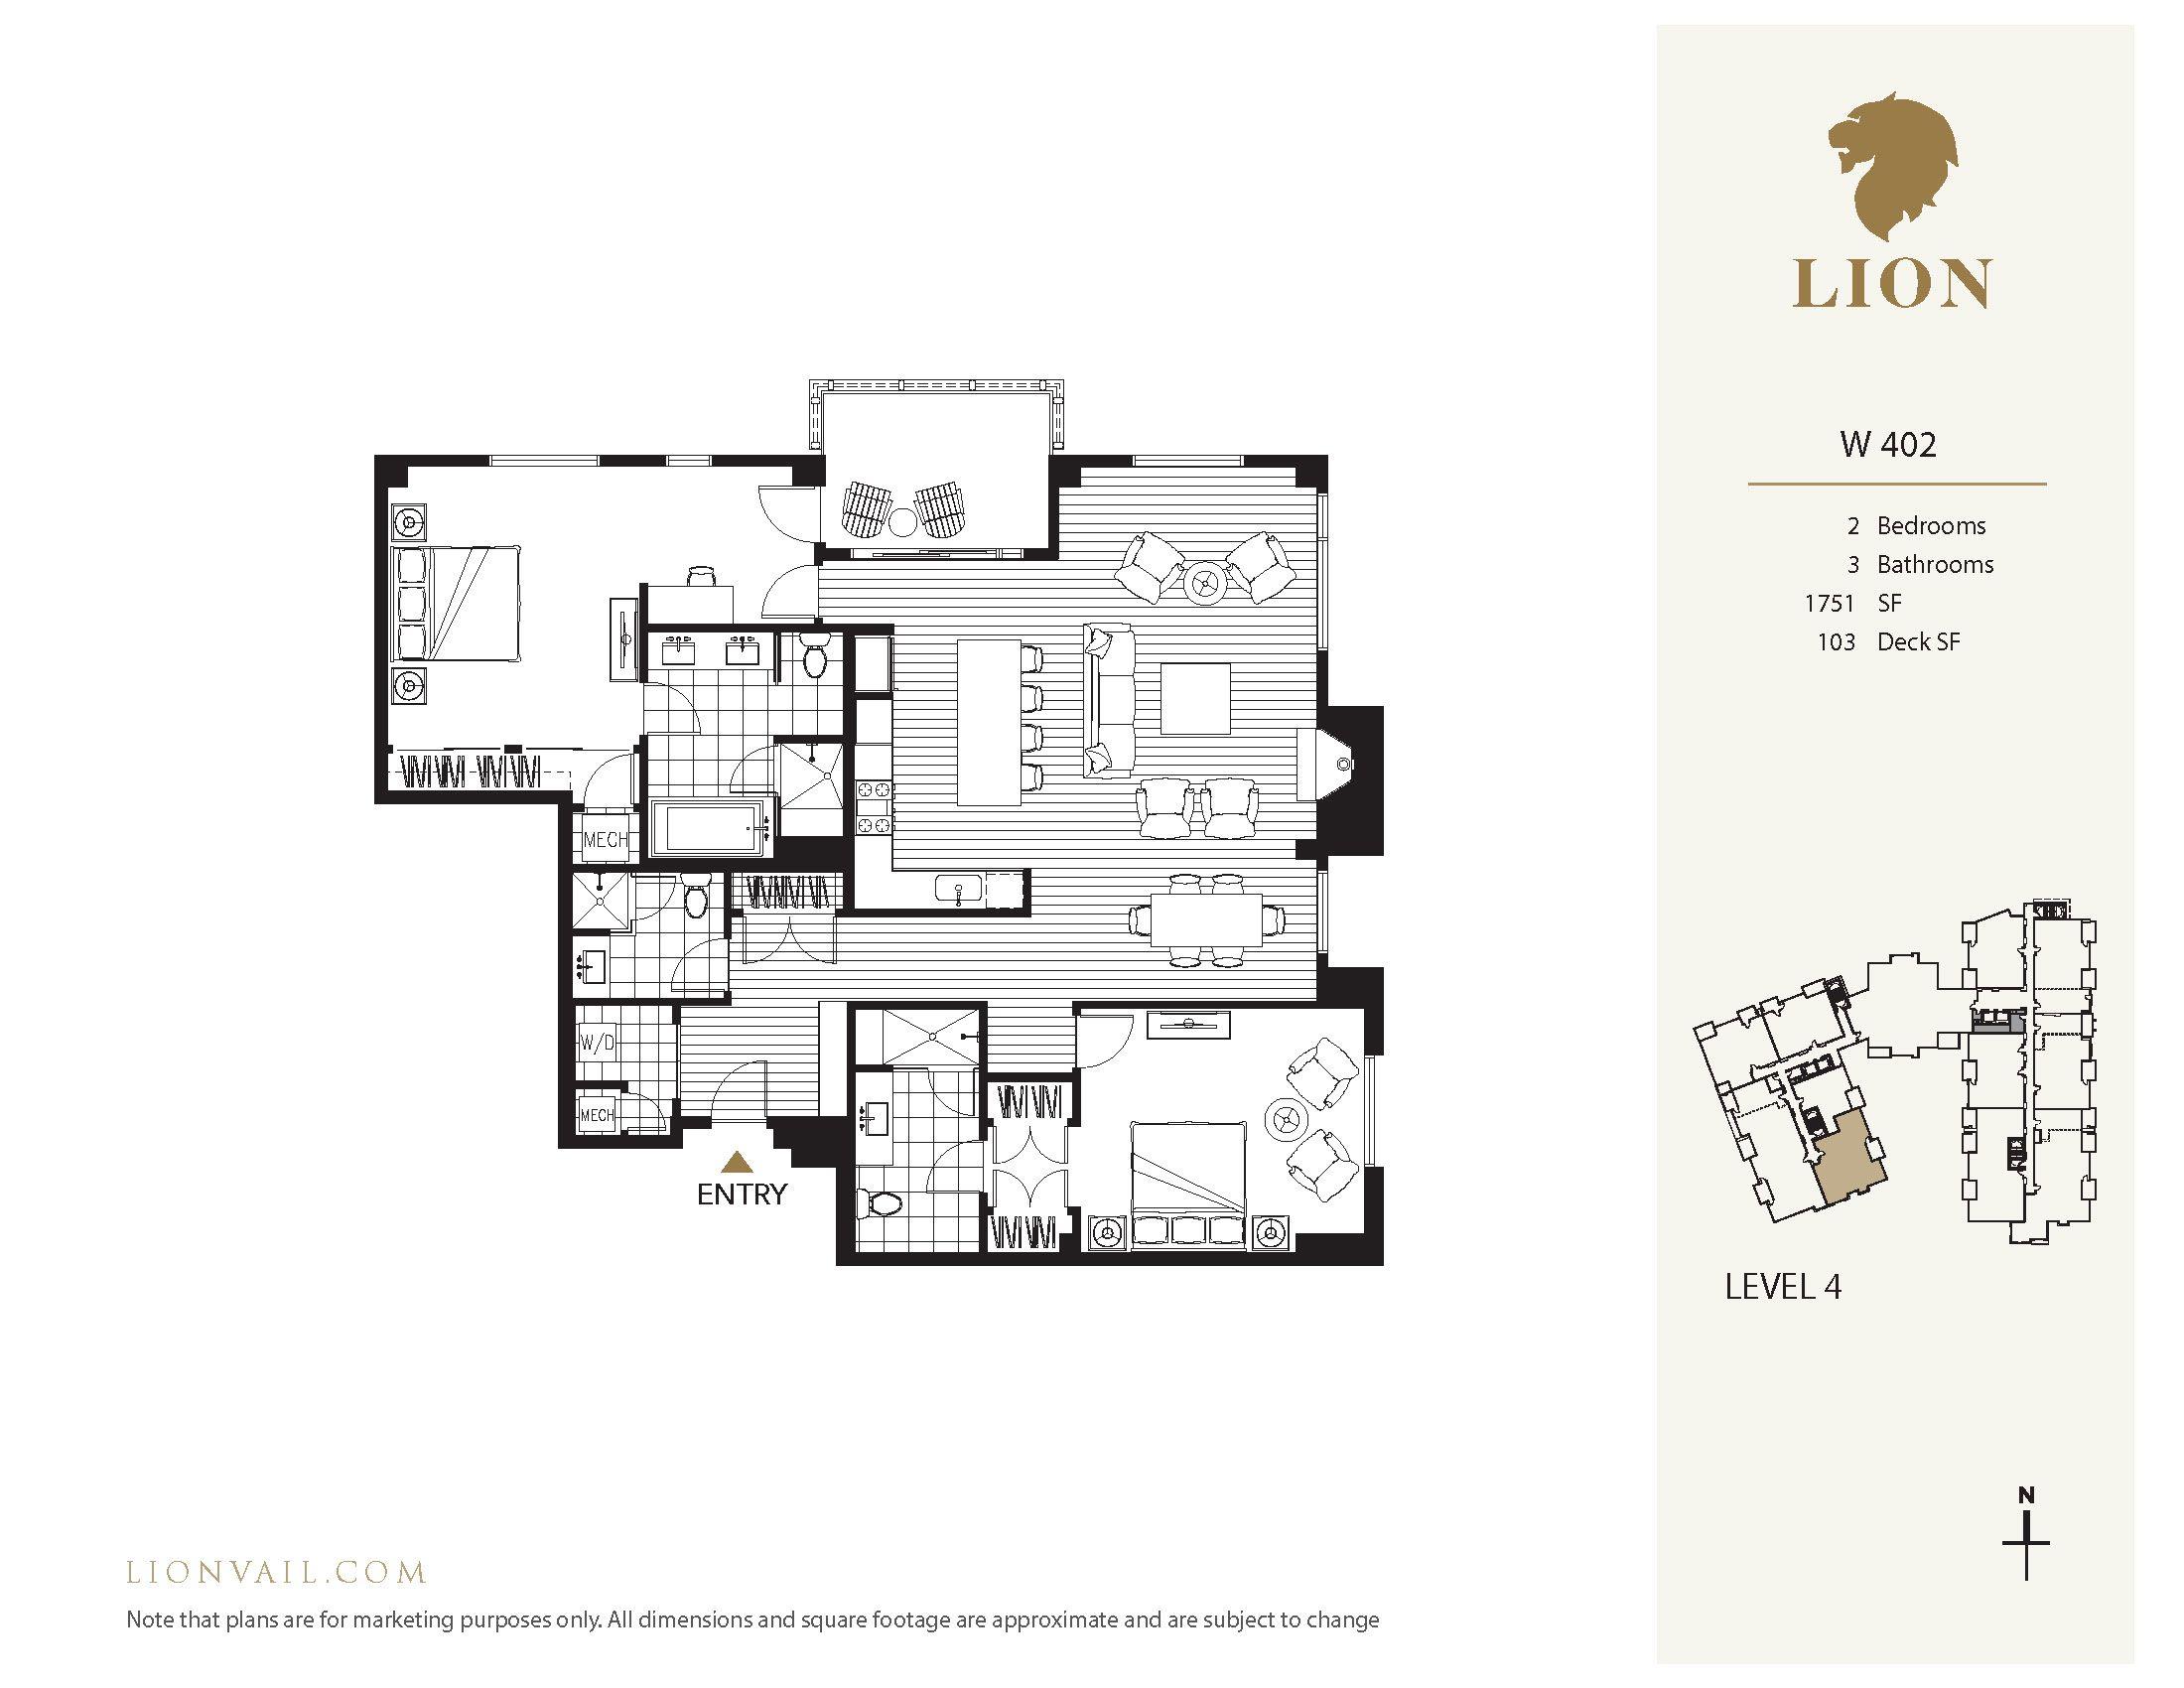 701 Lionshead Circle West W402 Vail, CO 81657